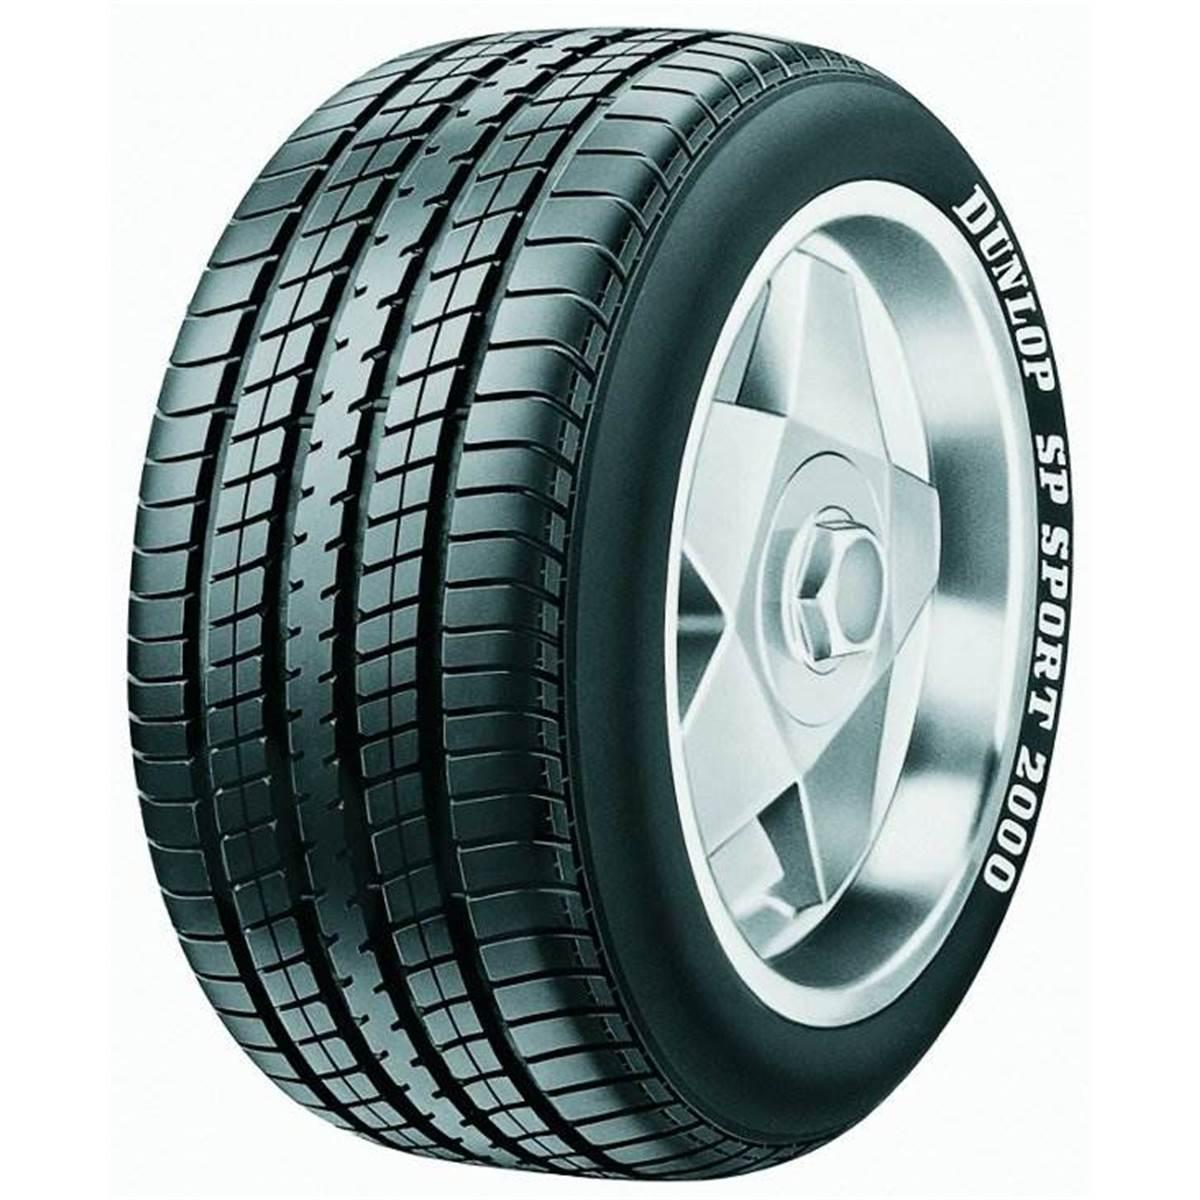 achat pneu dunlop sp sport 2000e 205 55 r16 91v pas cher. Black Bedroom Furniture Sets. Home Design Ideas